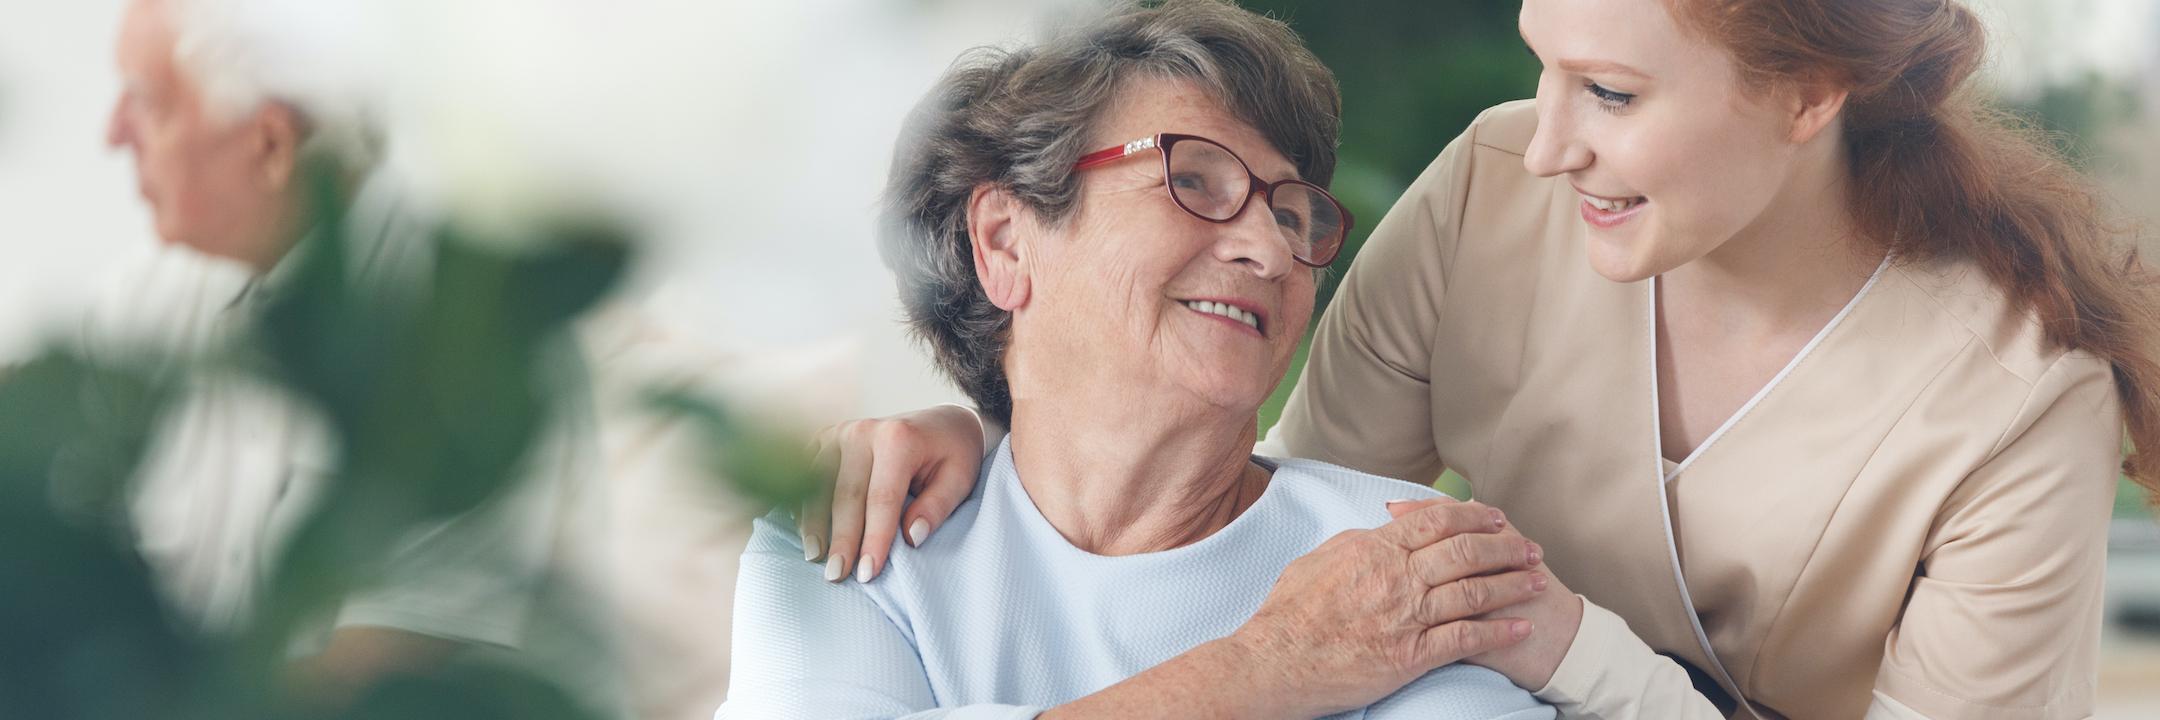 Professional helpful caregiver comforting smiling senior woman at nursing home